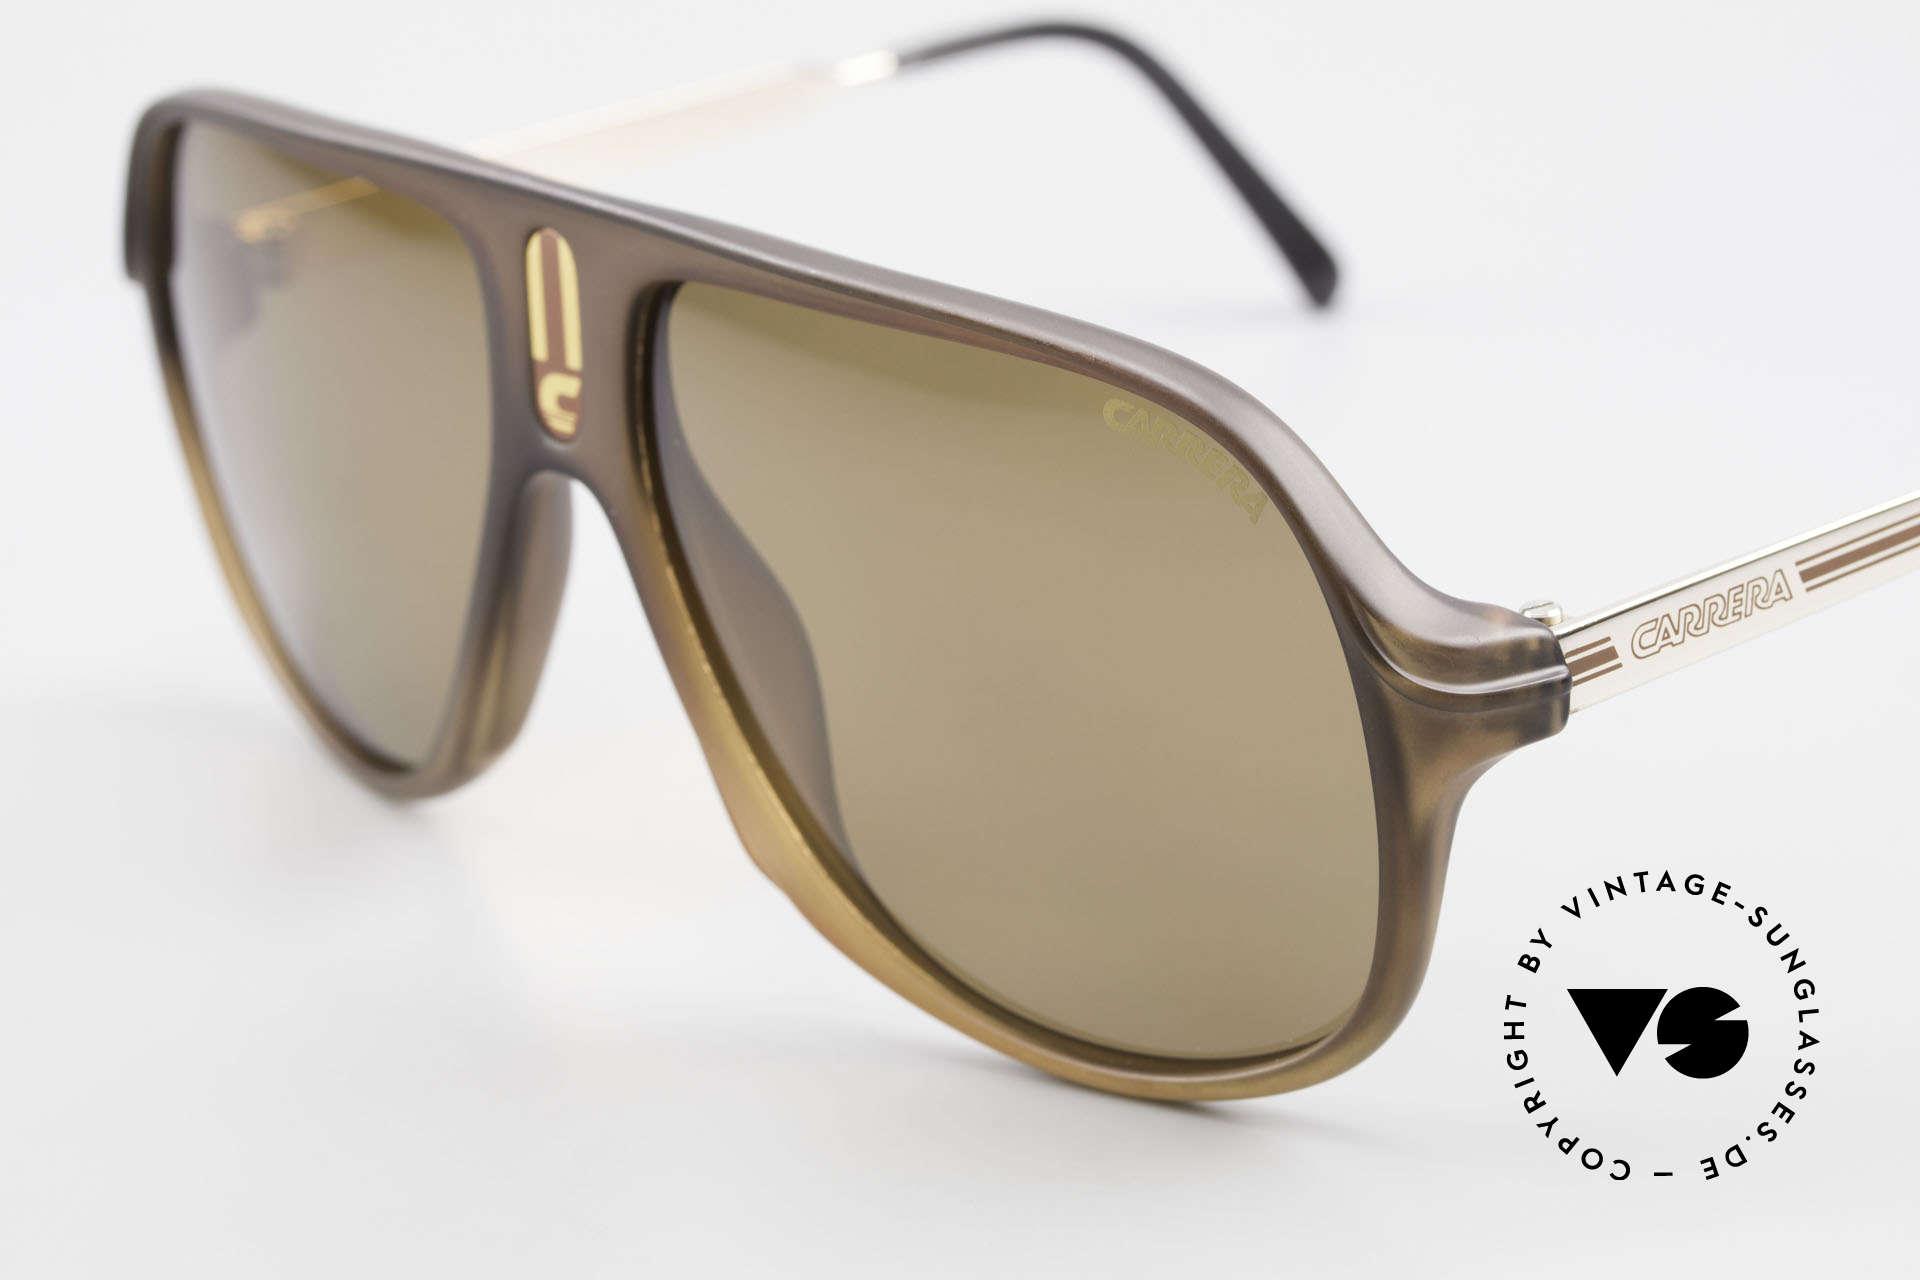 Carrera 5547 Polarized 80's Sunglasses, brown POLARIZED sun lenses for 100% UV protection, Made for Men